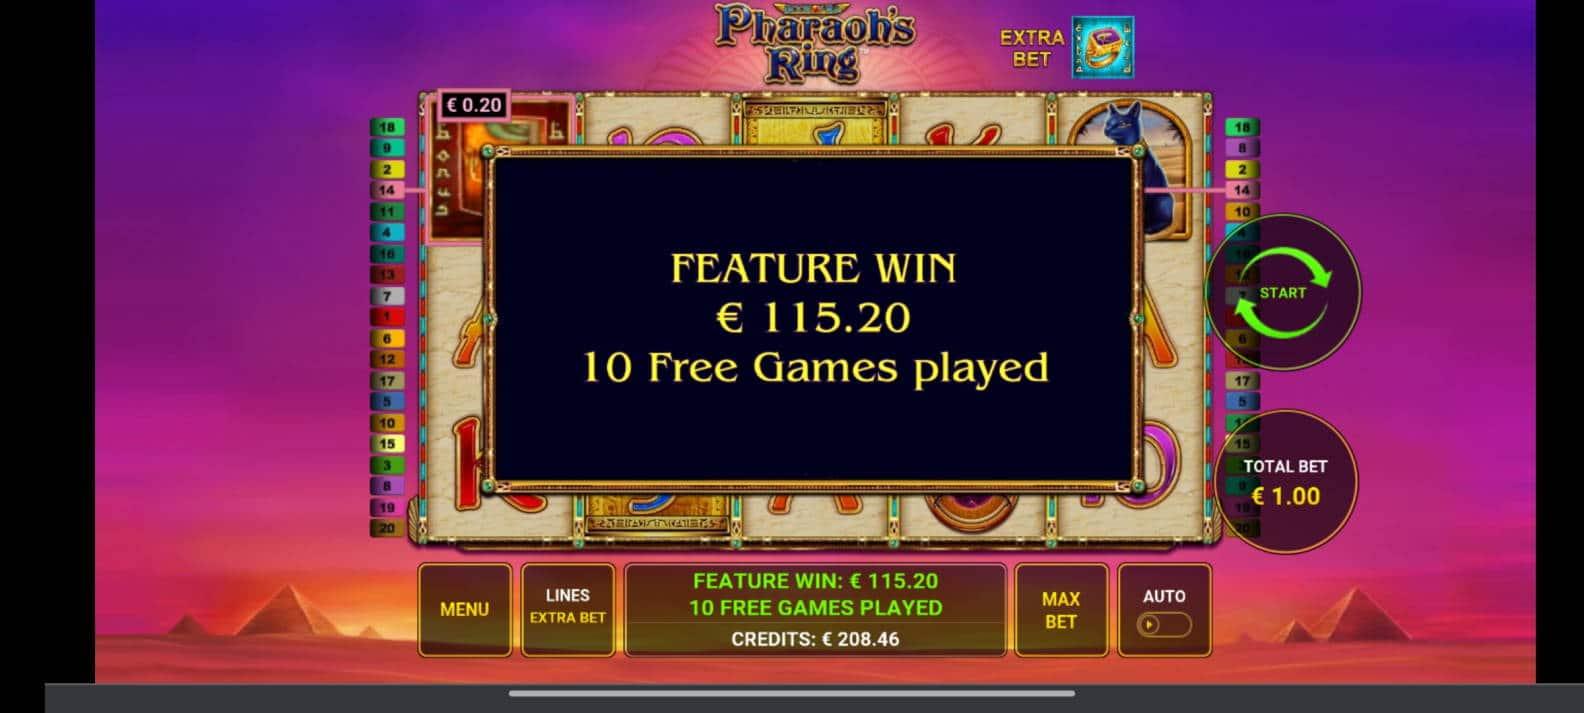 Pharaohs Ring Casino win picture by tiikerililja87 25.7.2021 115.20e 115X